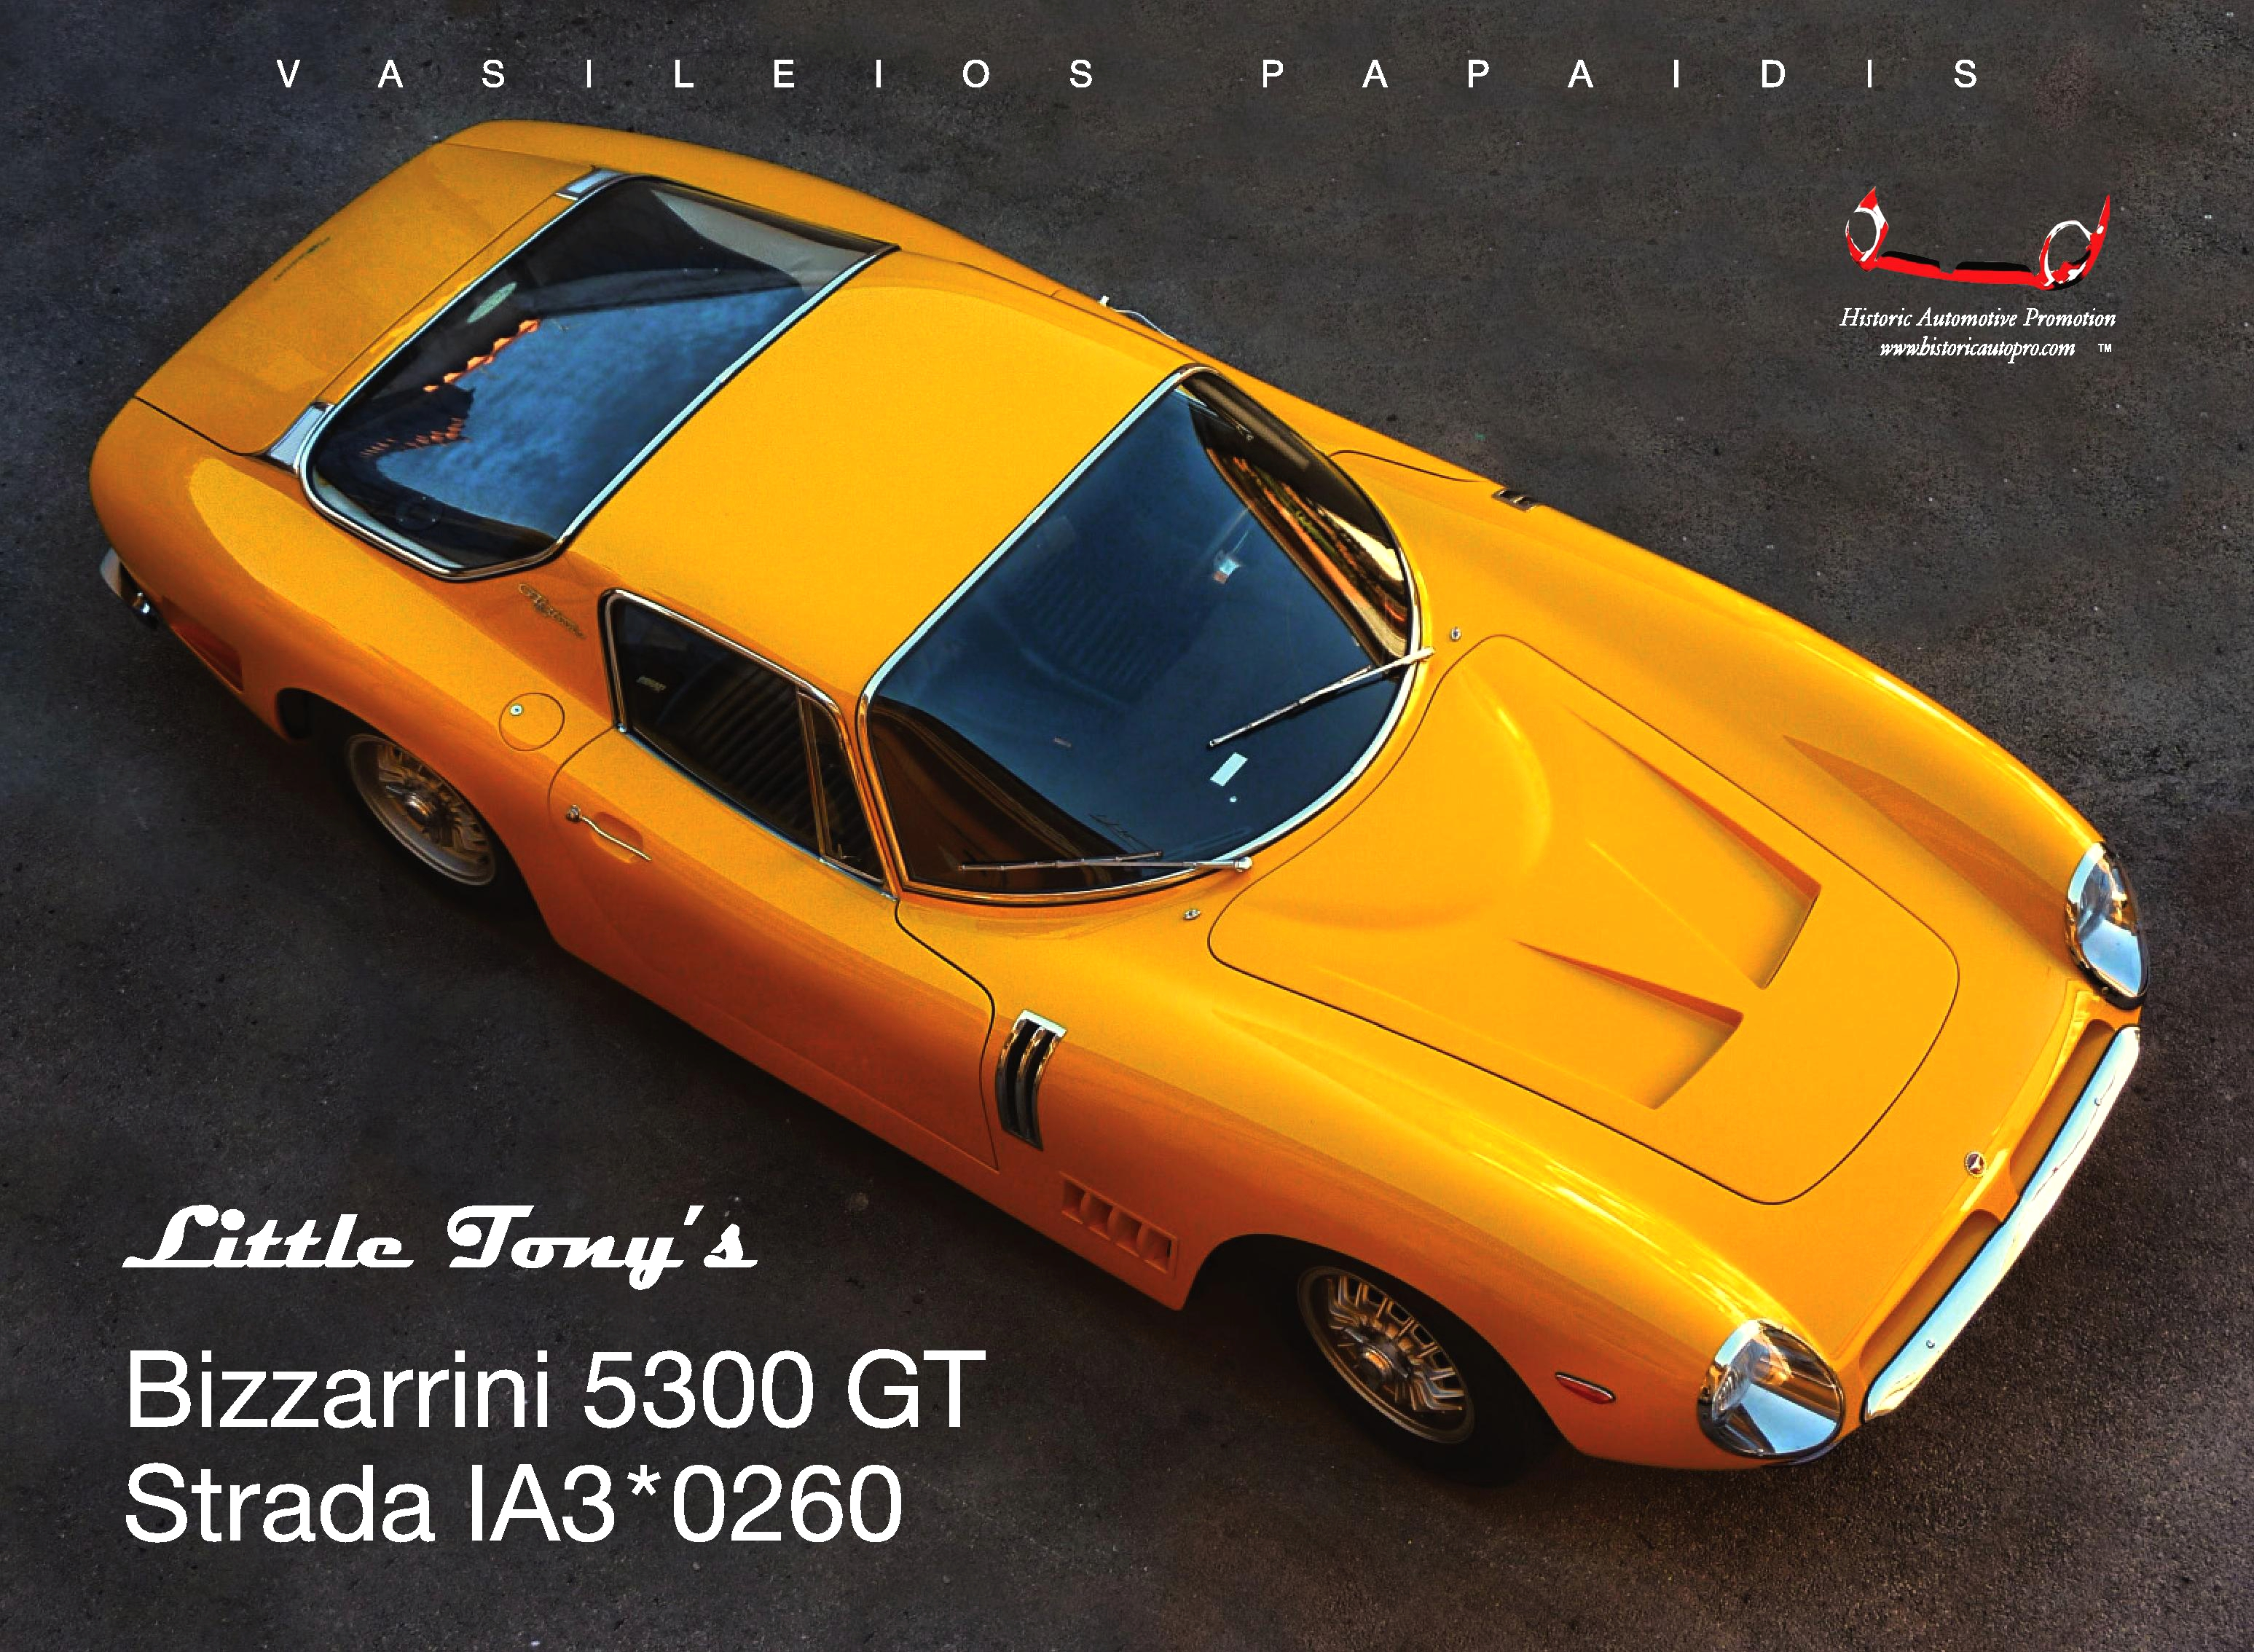 Little Tony's Bizzarrini 5300 GT Str